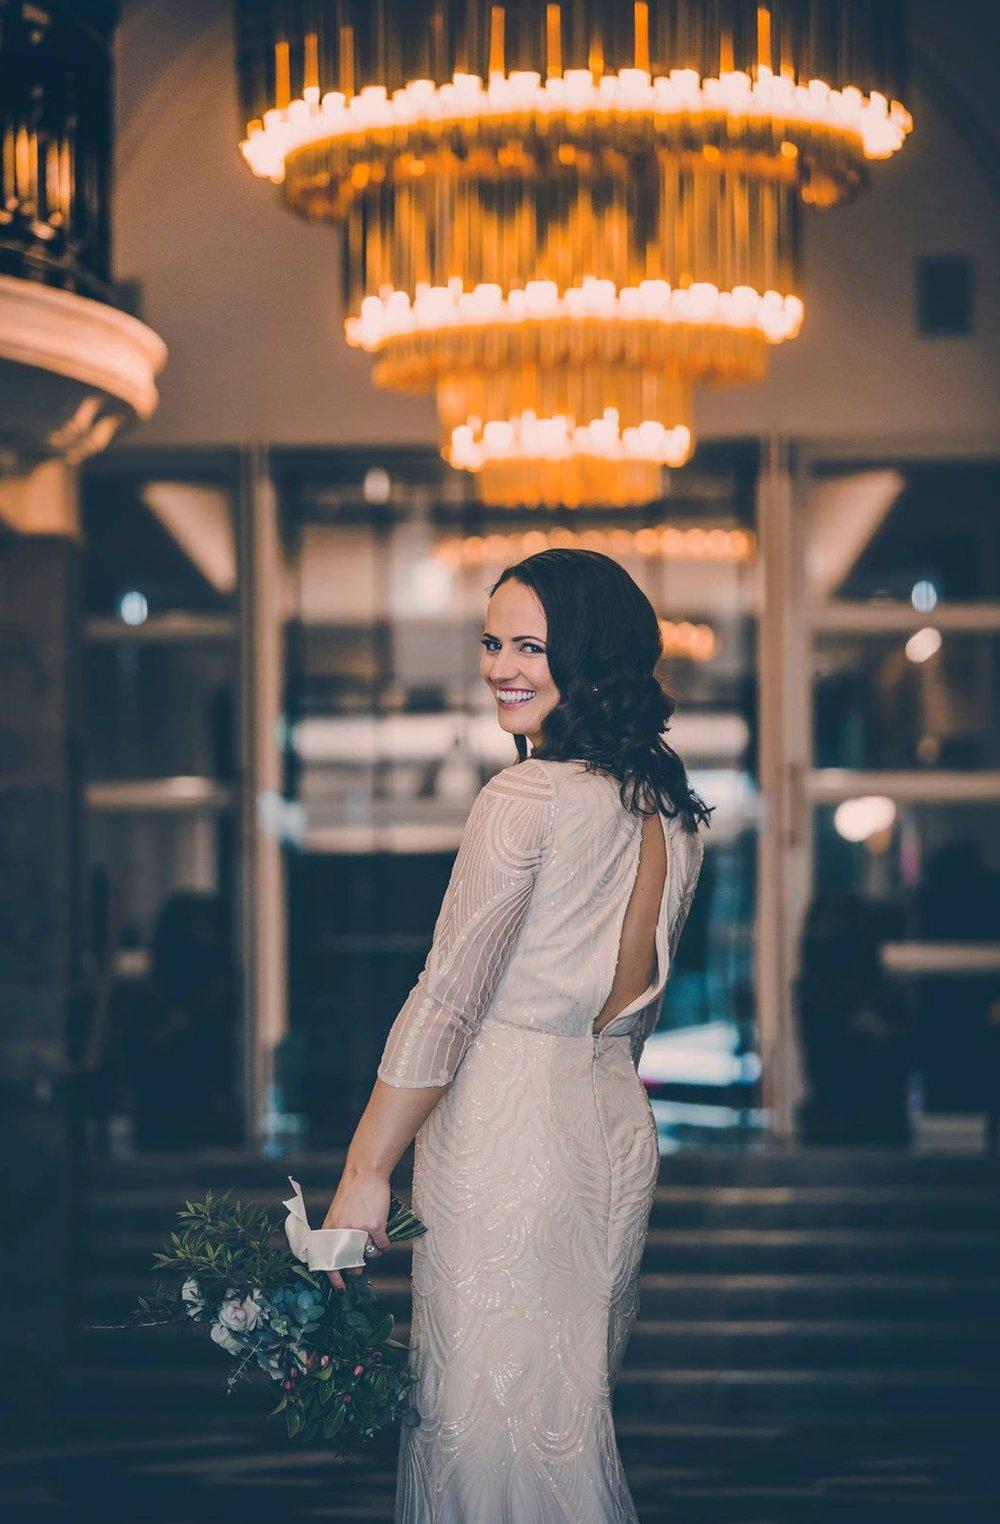 Elizabeth_may_bridal_image2.JPG